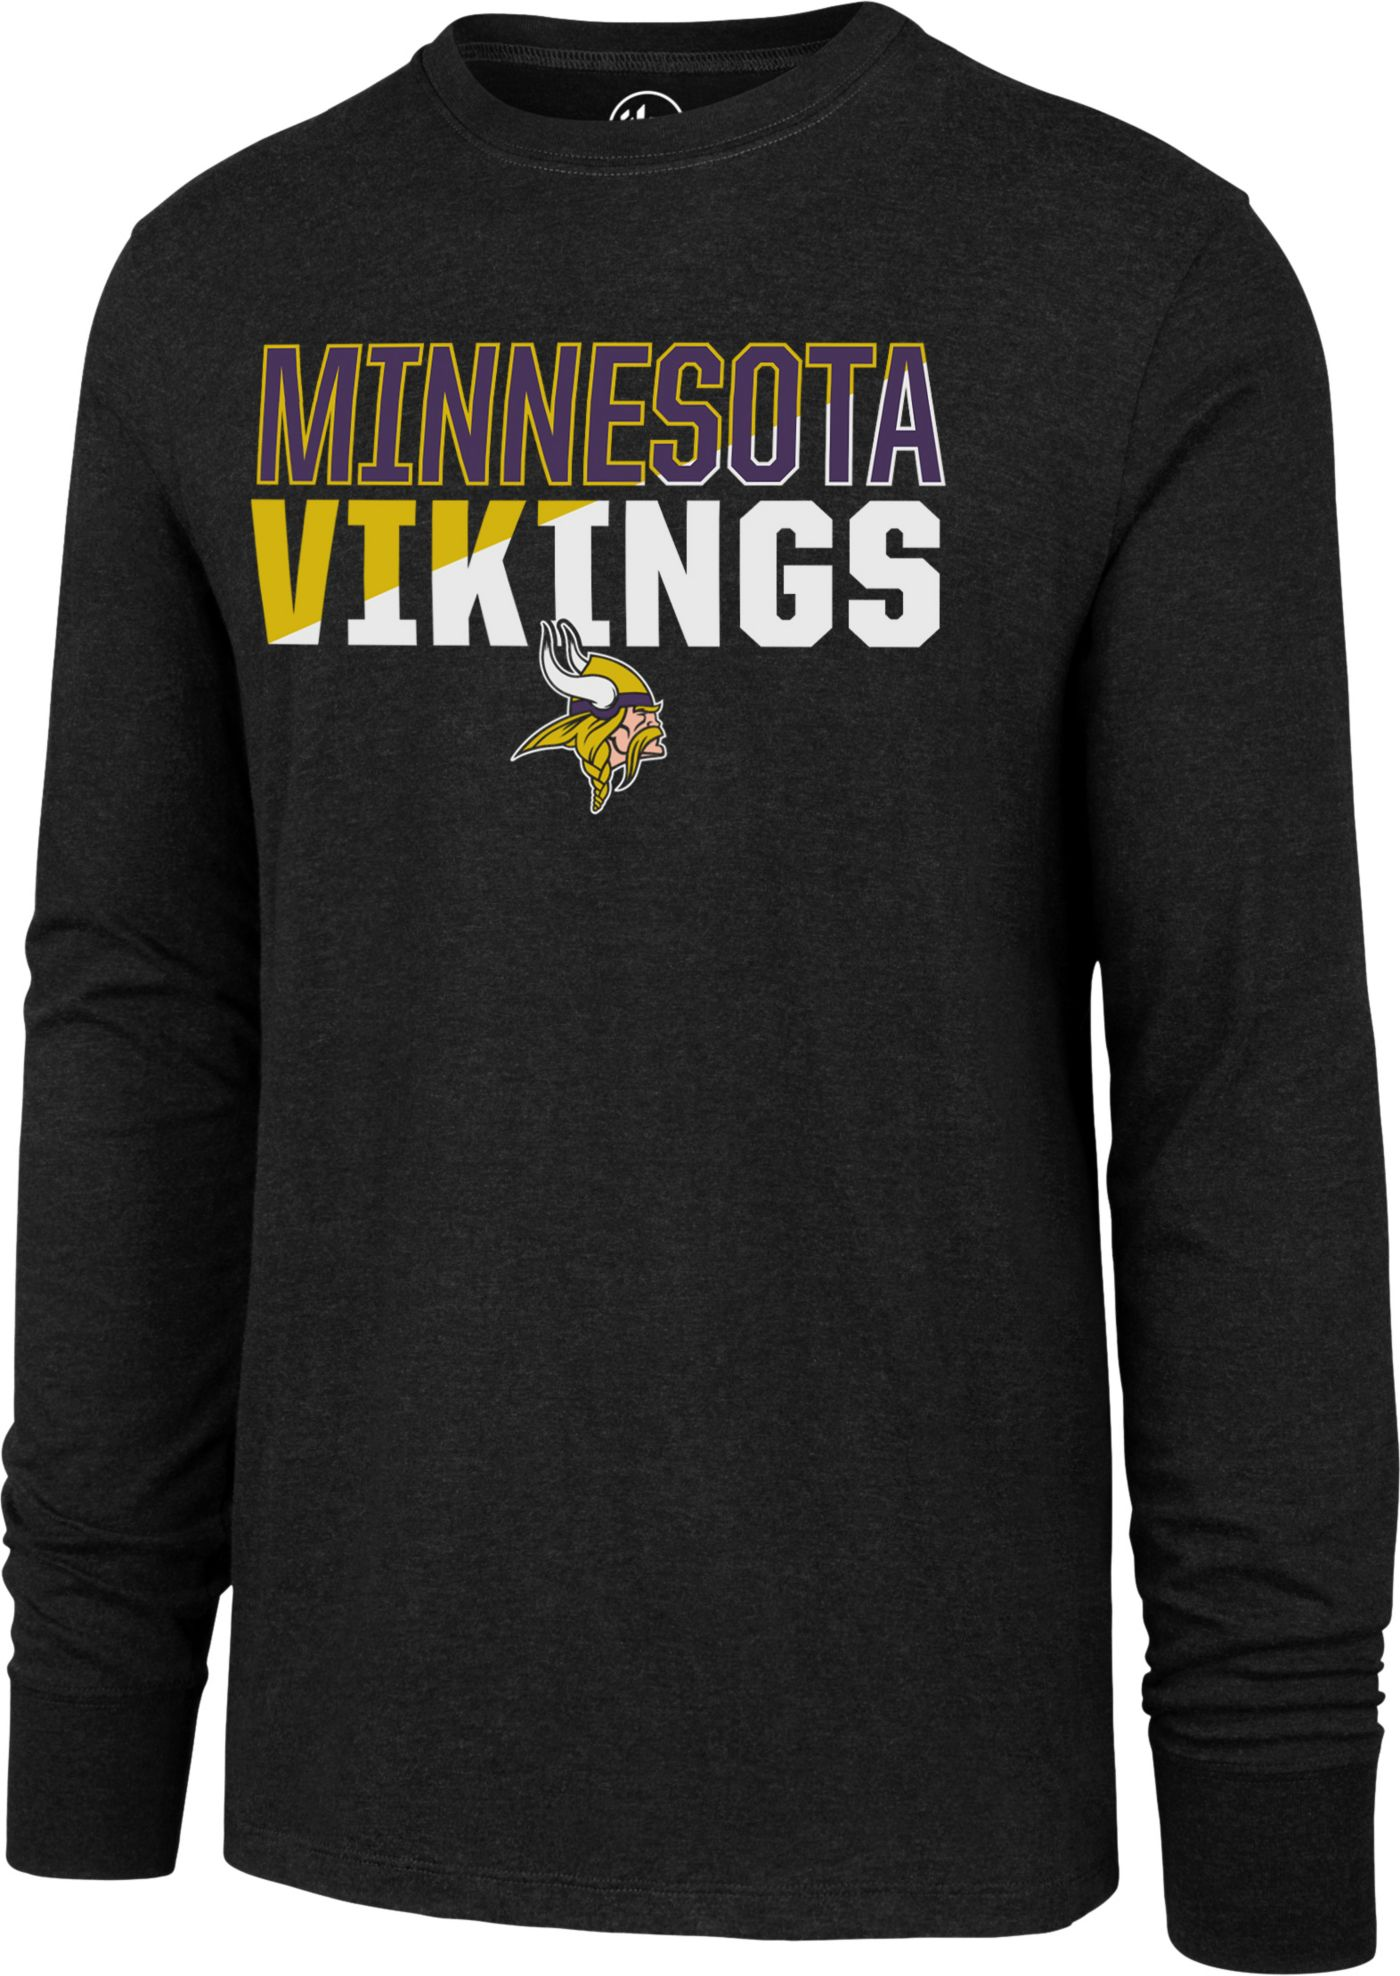 '47 Men's Minnesota Vikings Club Long Sleeve Black Shirt